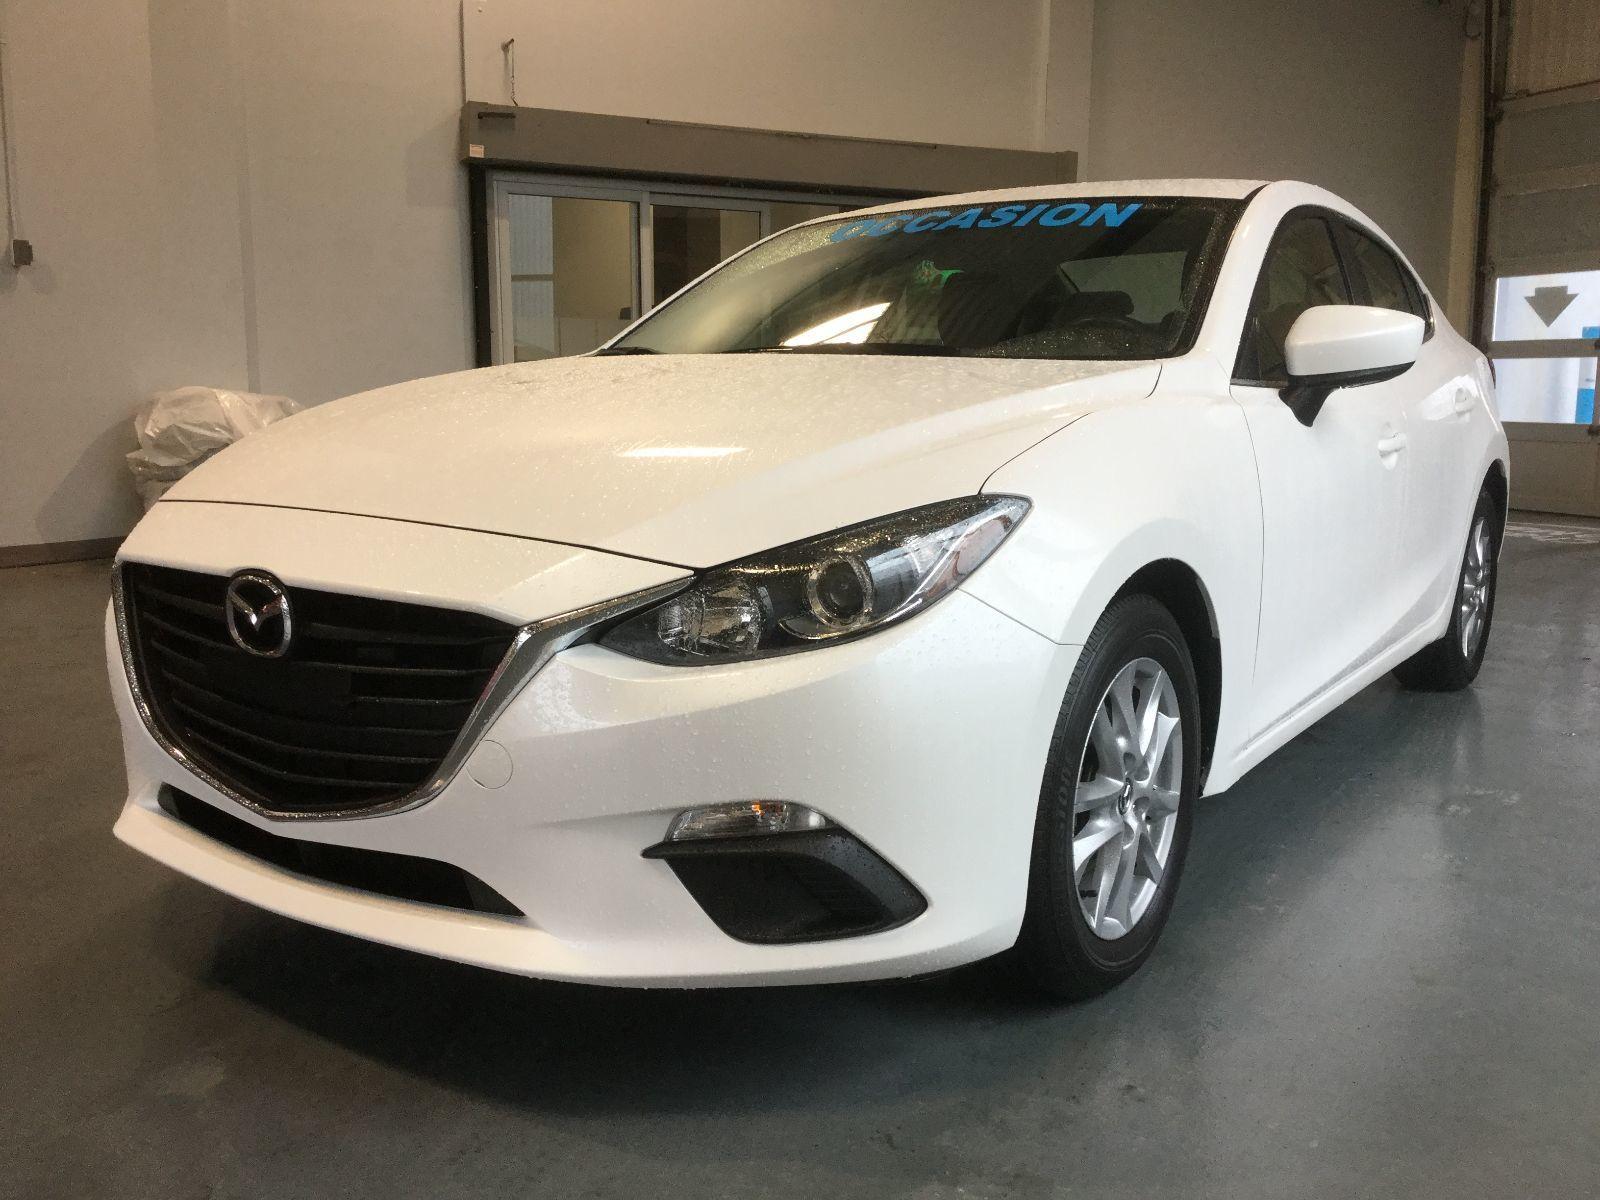 Mazda Mazda3 GS,SIÈGES CHAUFFANTS, BLUETOOTH, MAGS, CAMERA, A/C 2015 UN SEUL PROPRIÉTAIRE